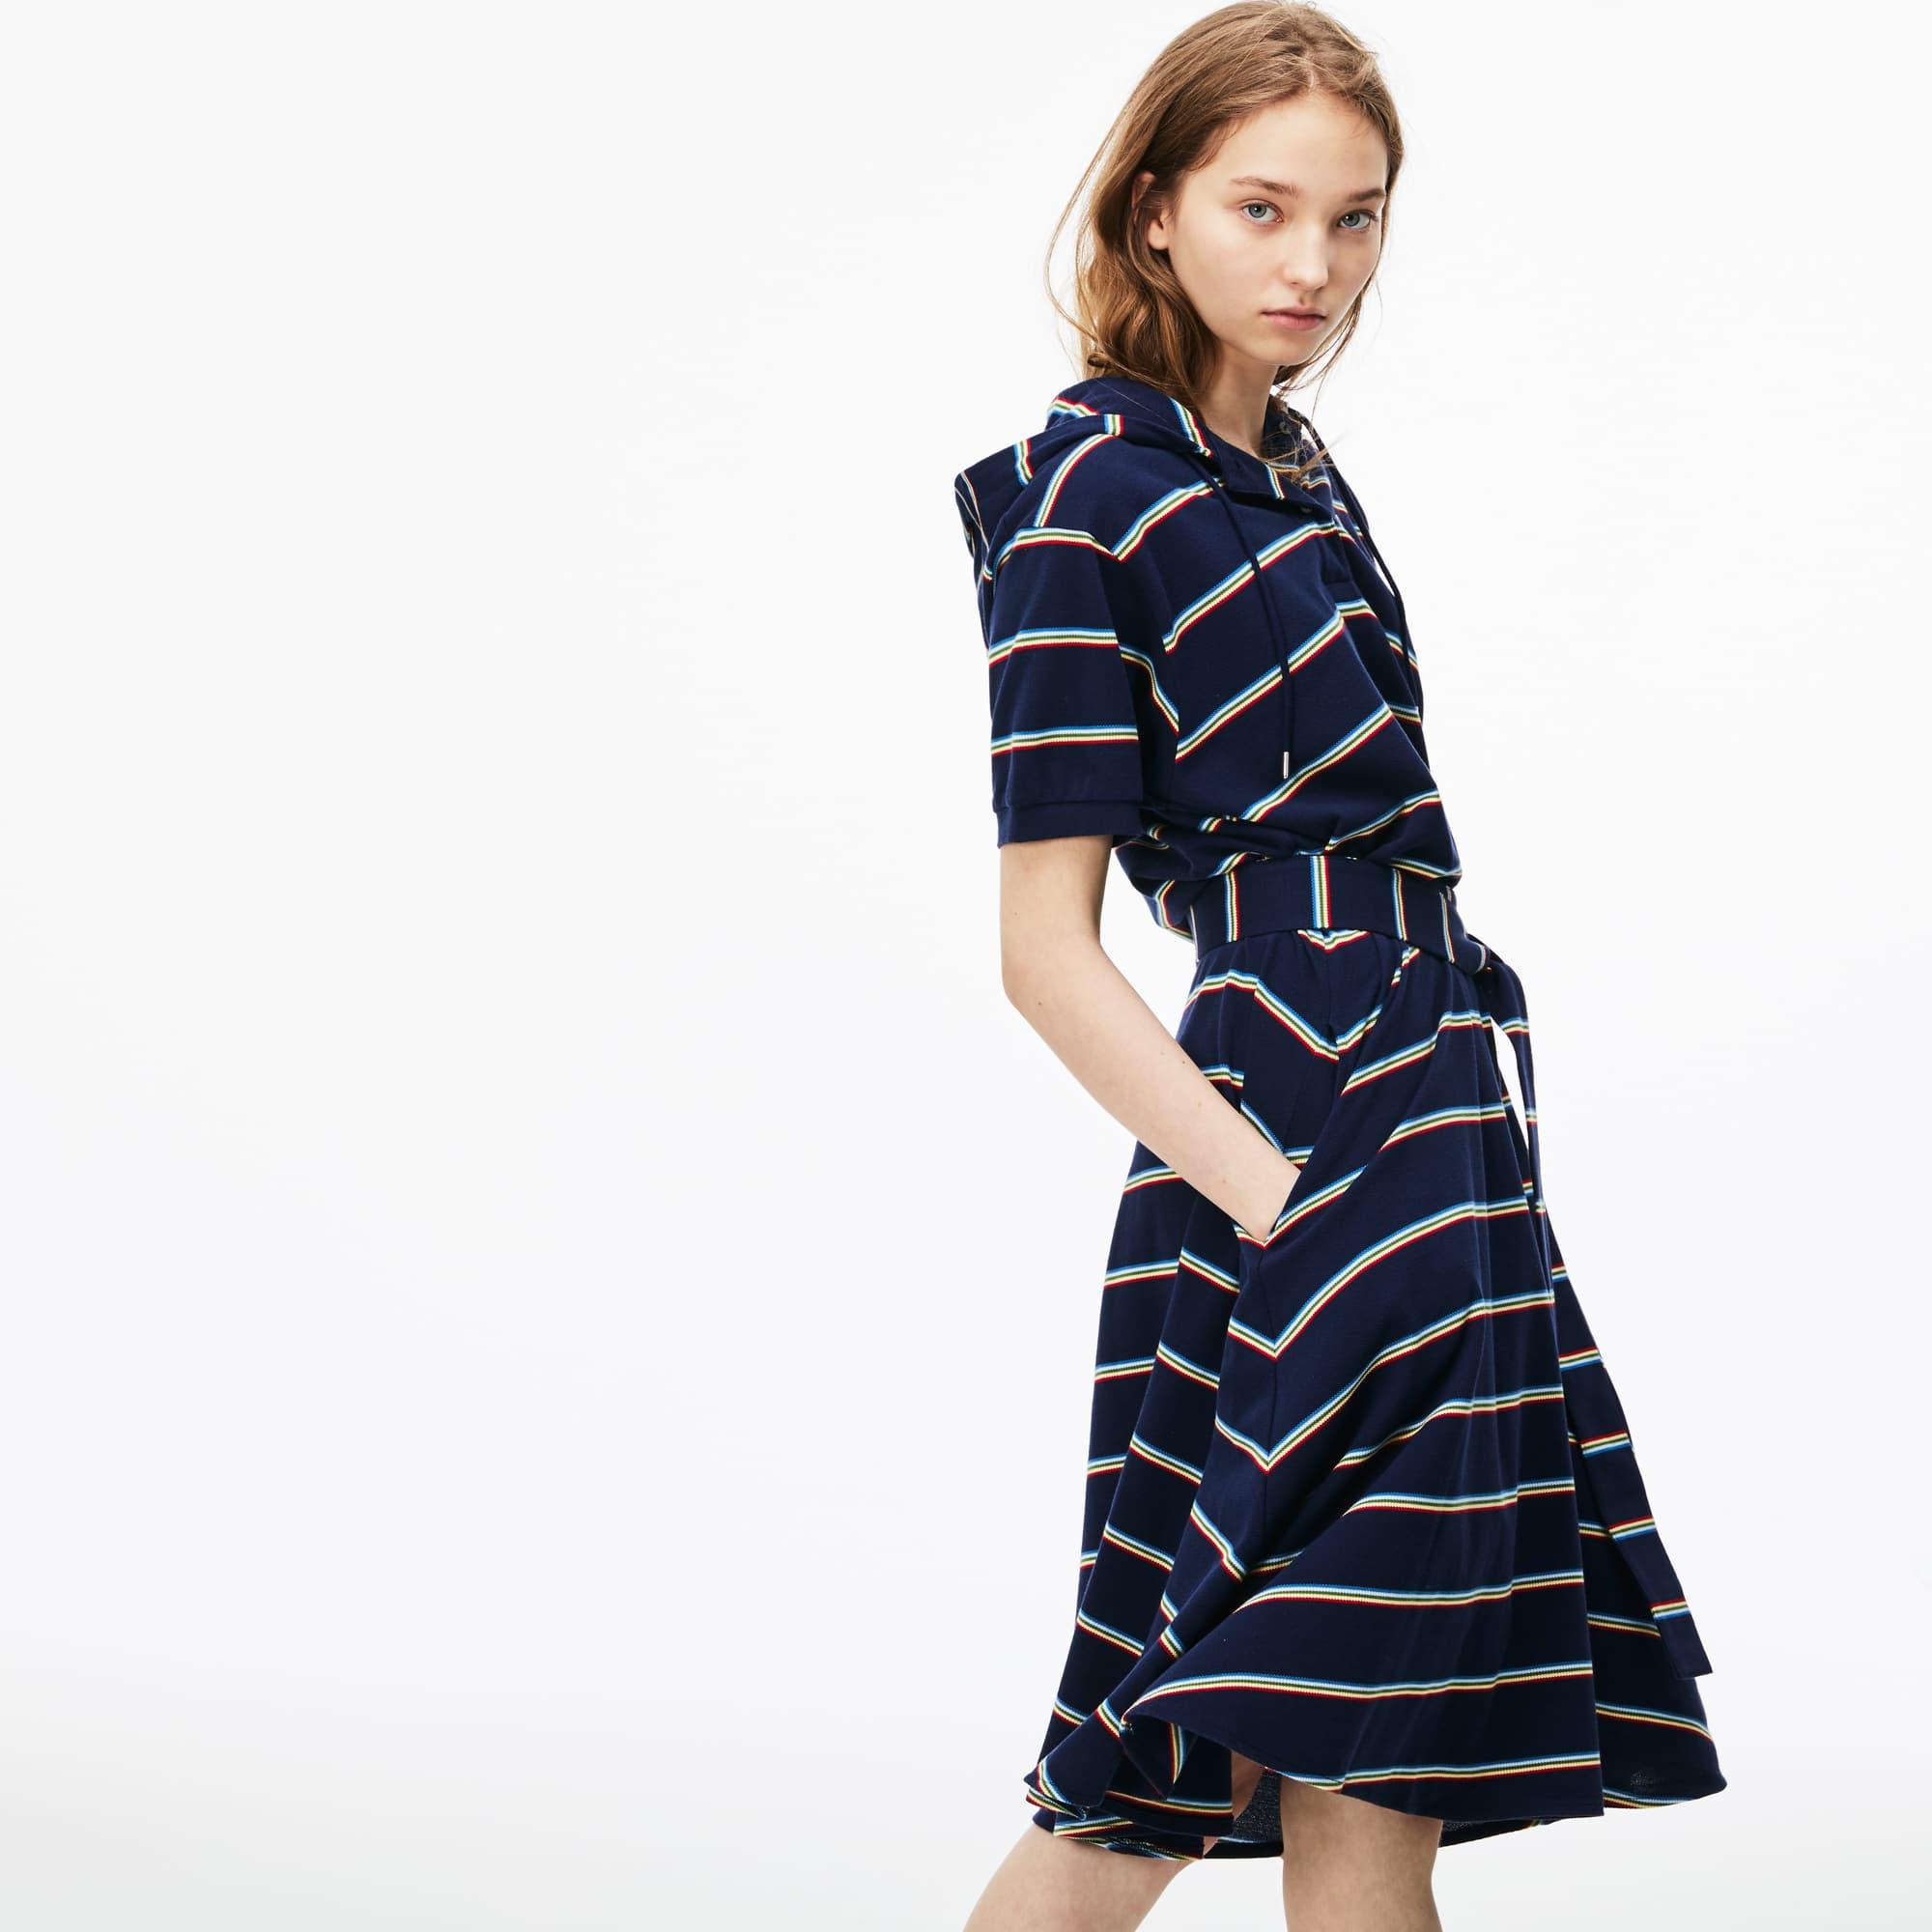 Women's Hooded Striped Cotton Piqué Polo Dress